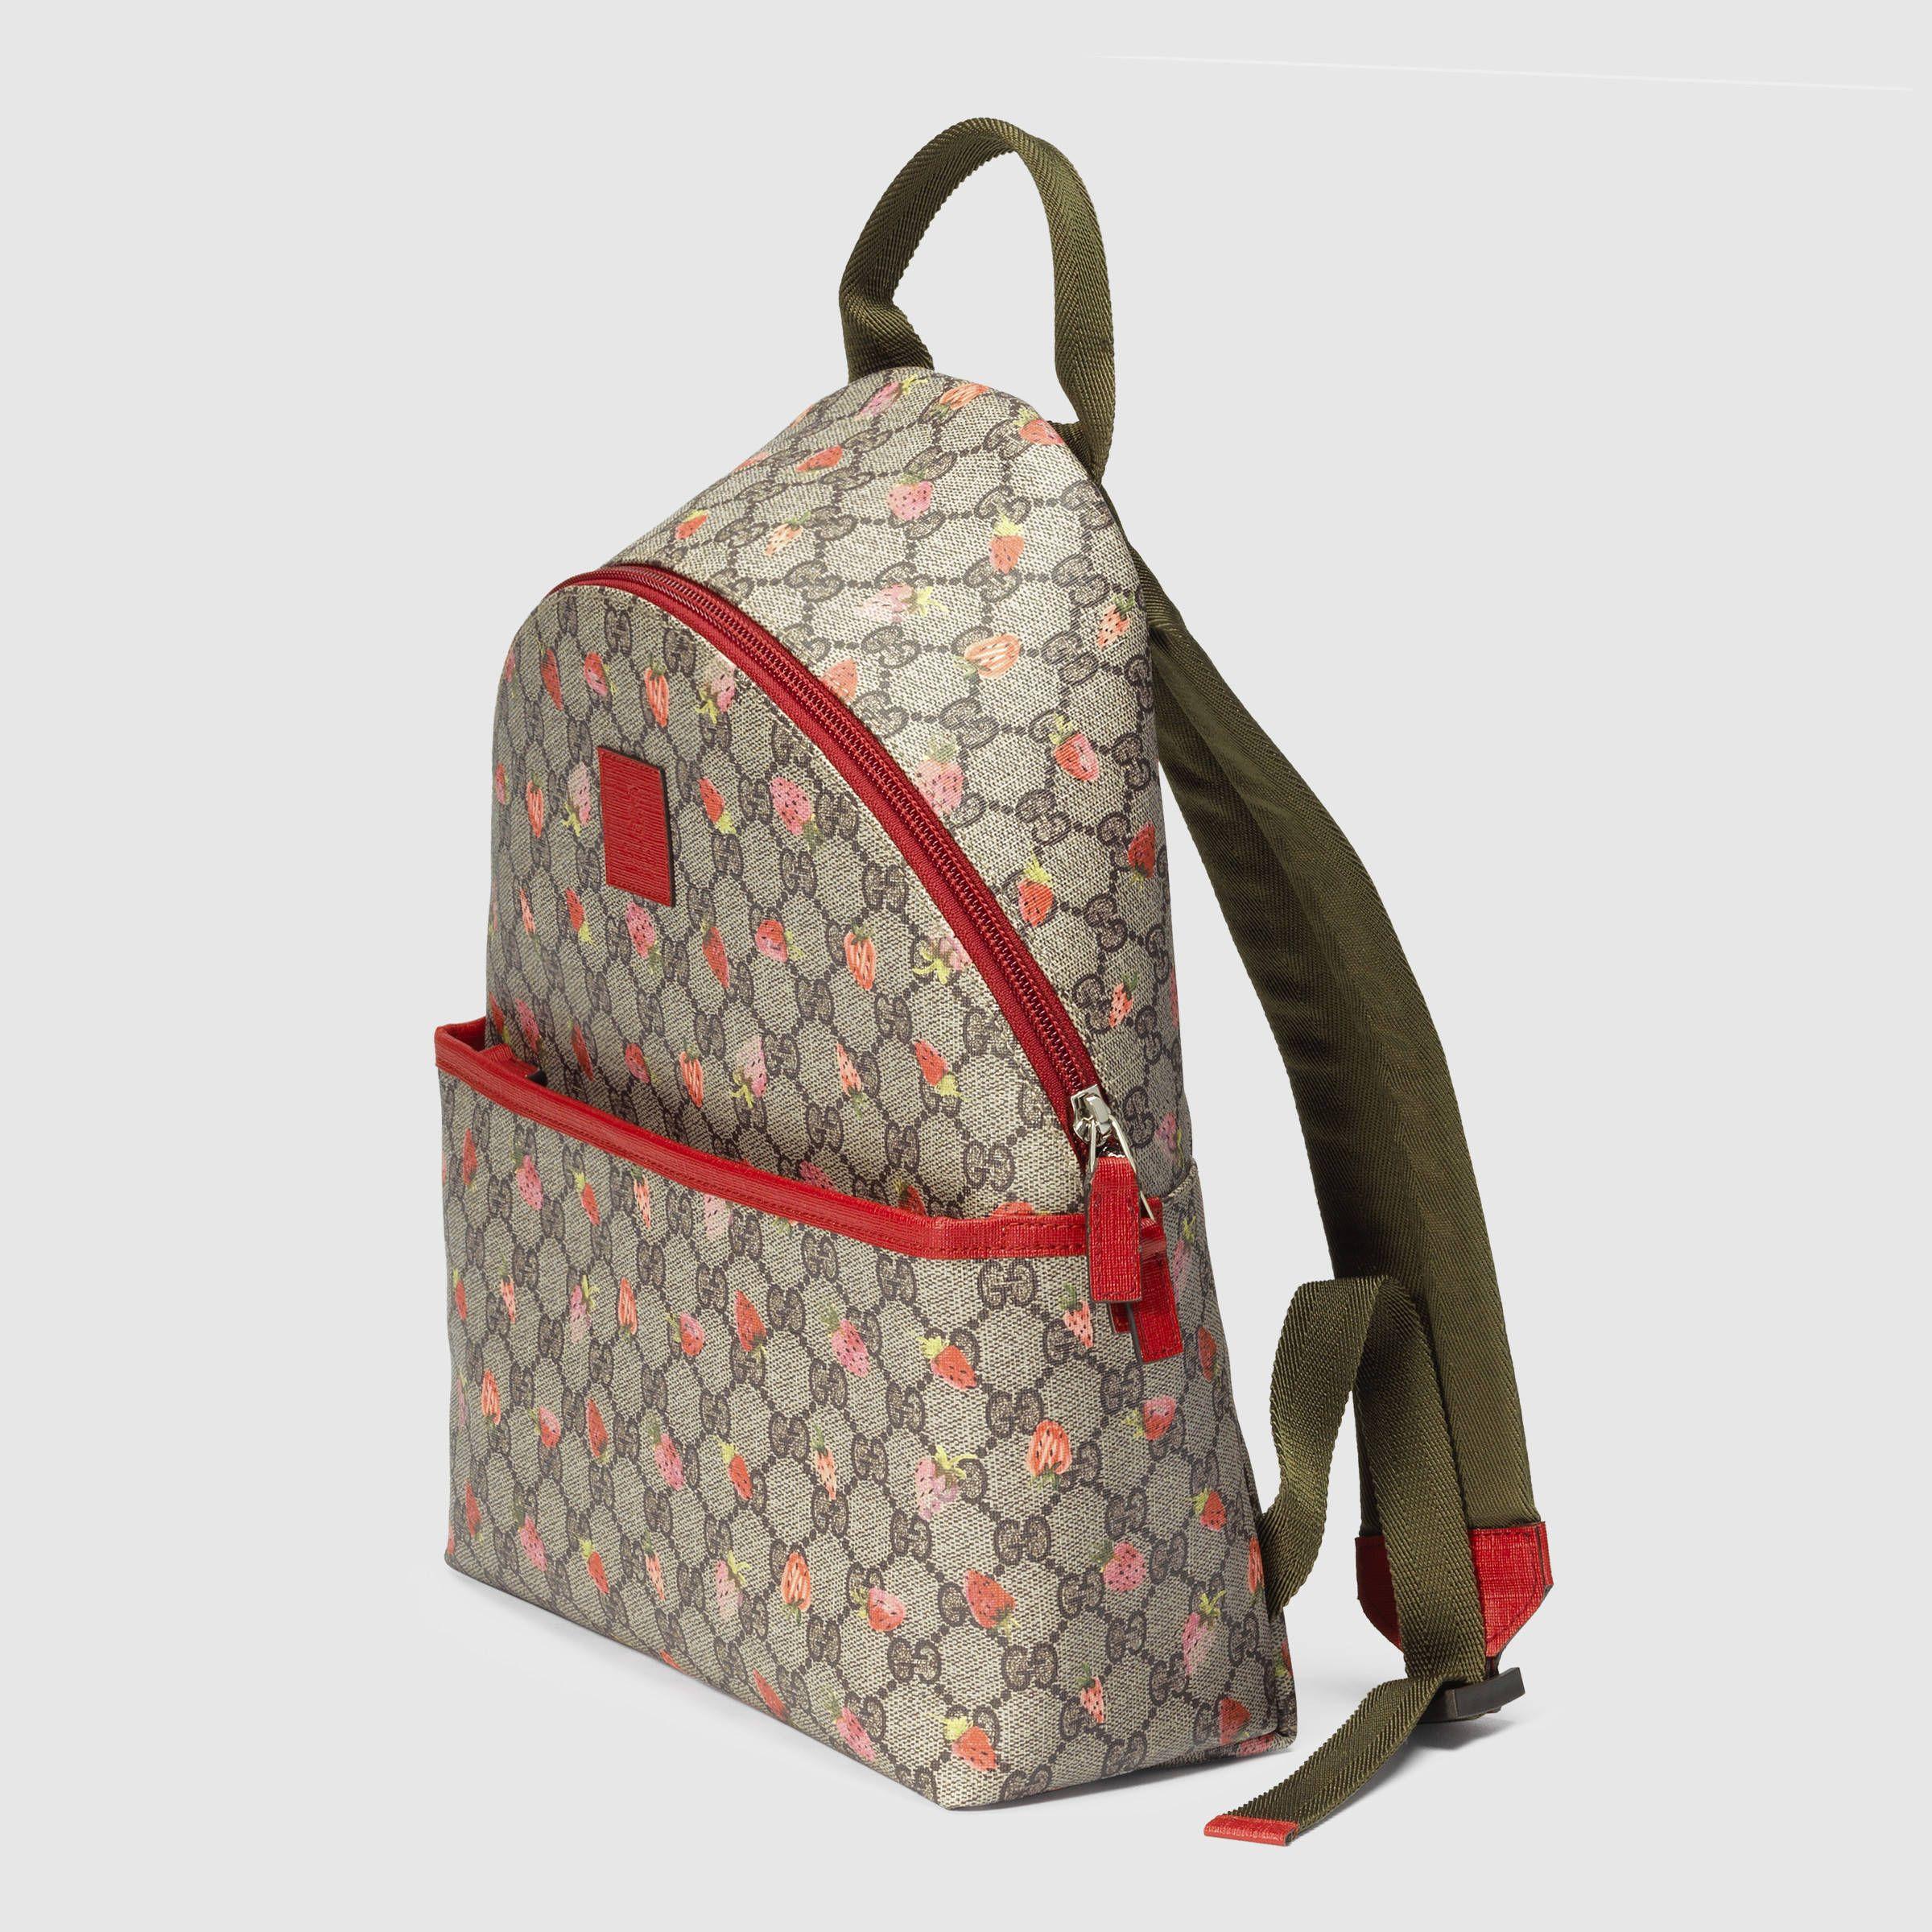 b6232acdb814 Gucci Children - Children s GG strawberry backpack - 271327KXG1N8897 ...